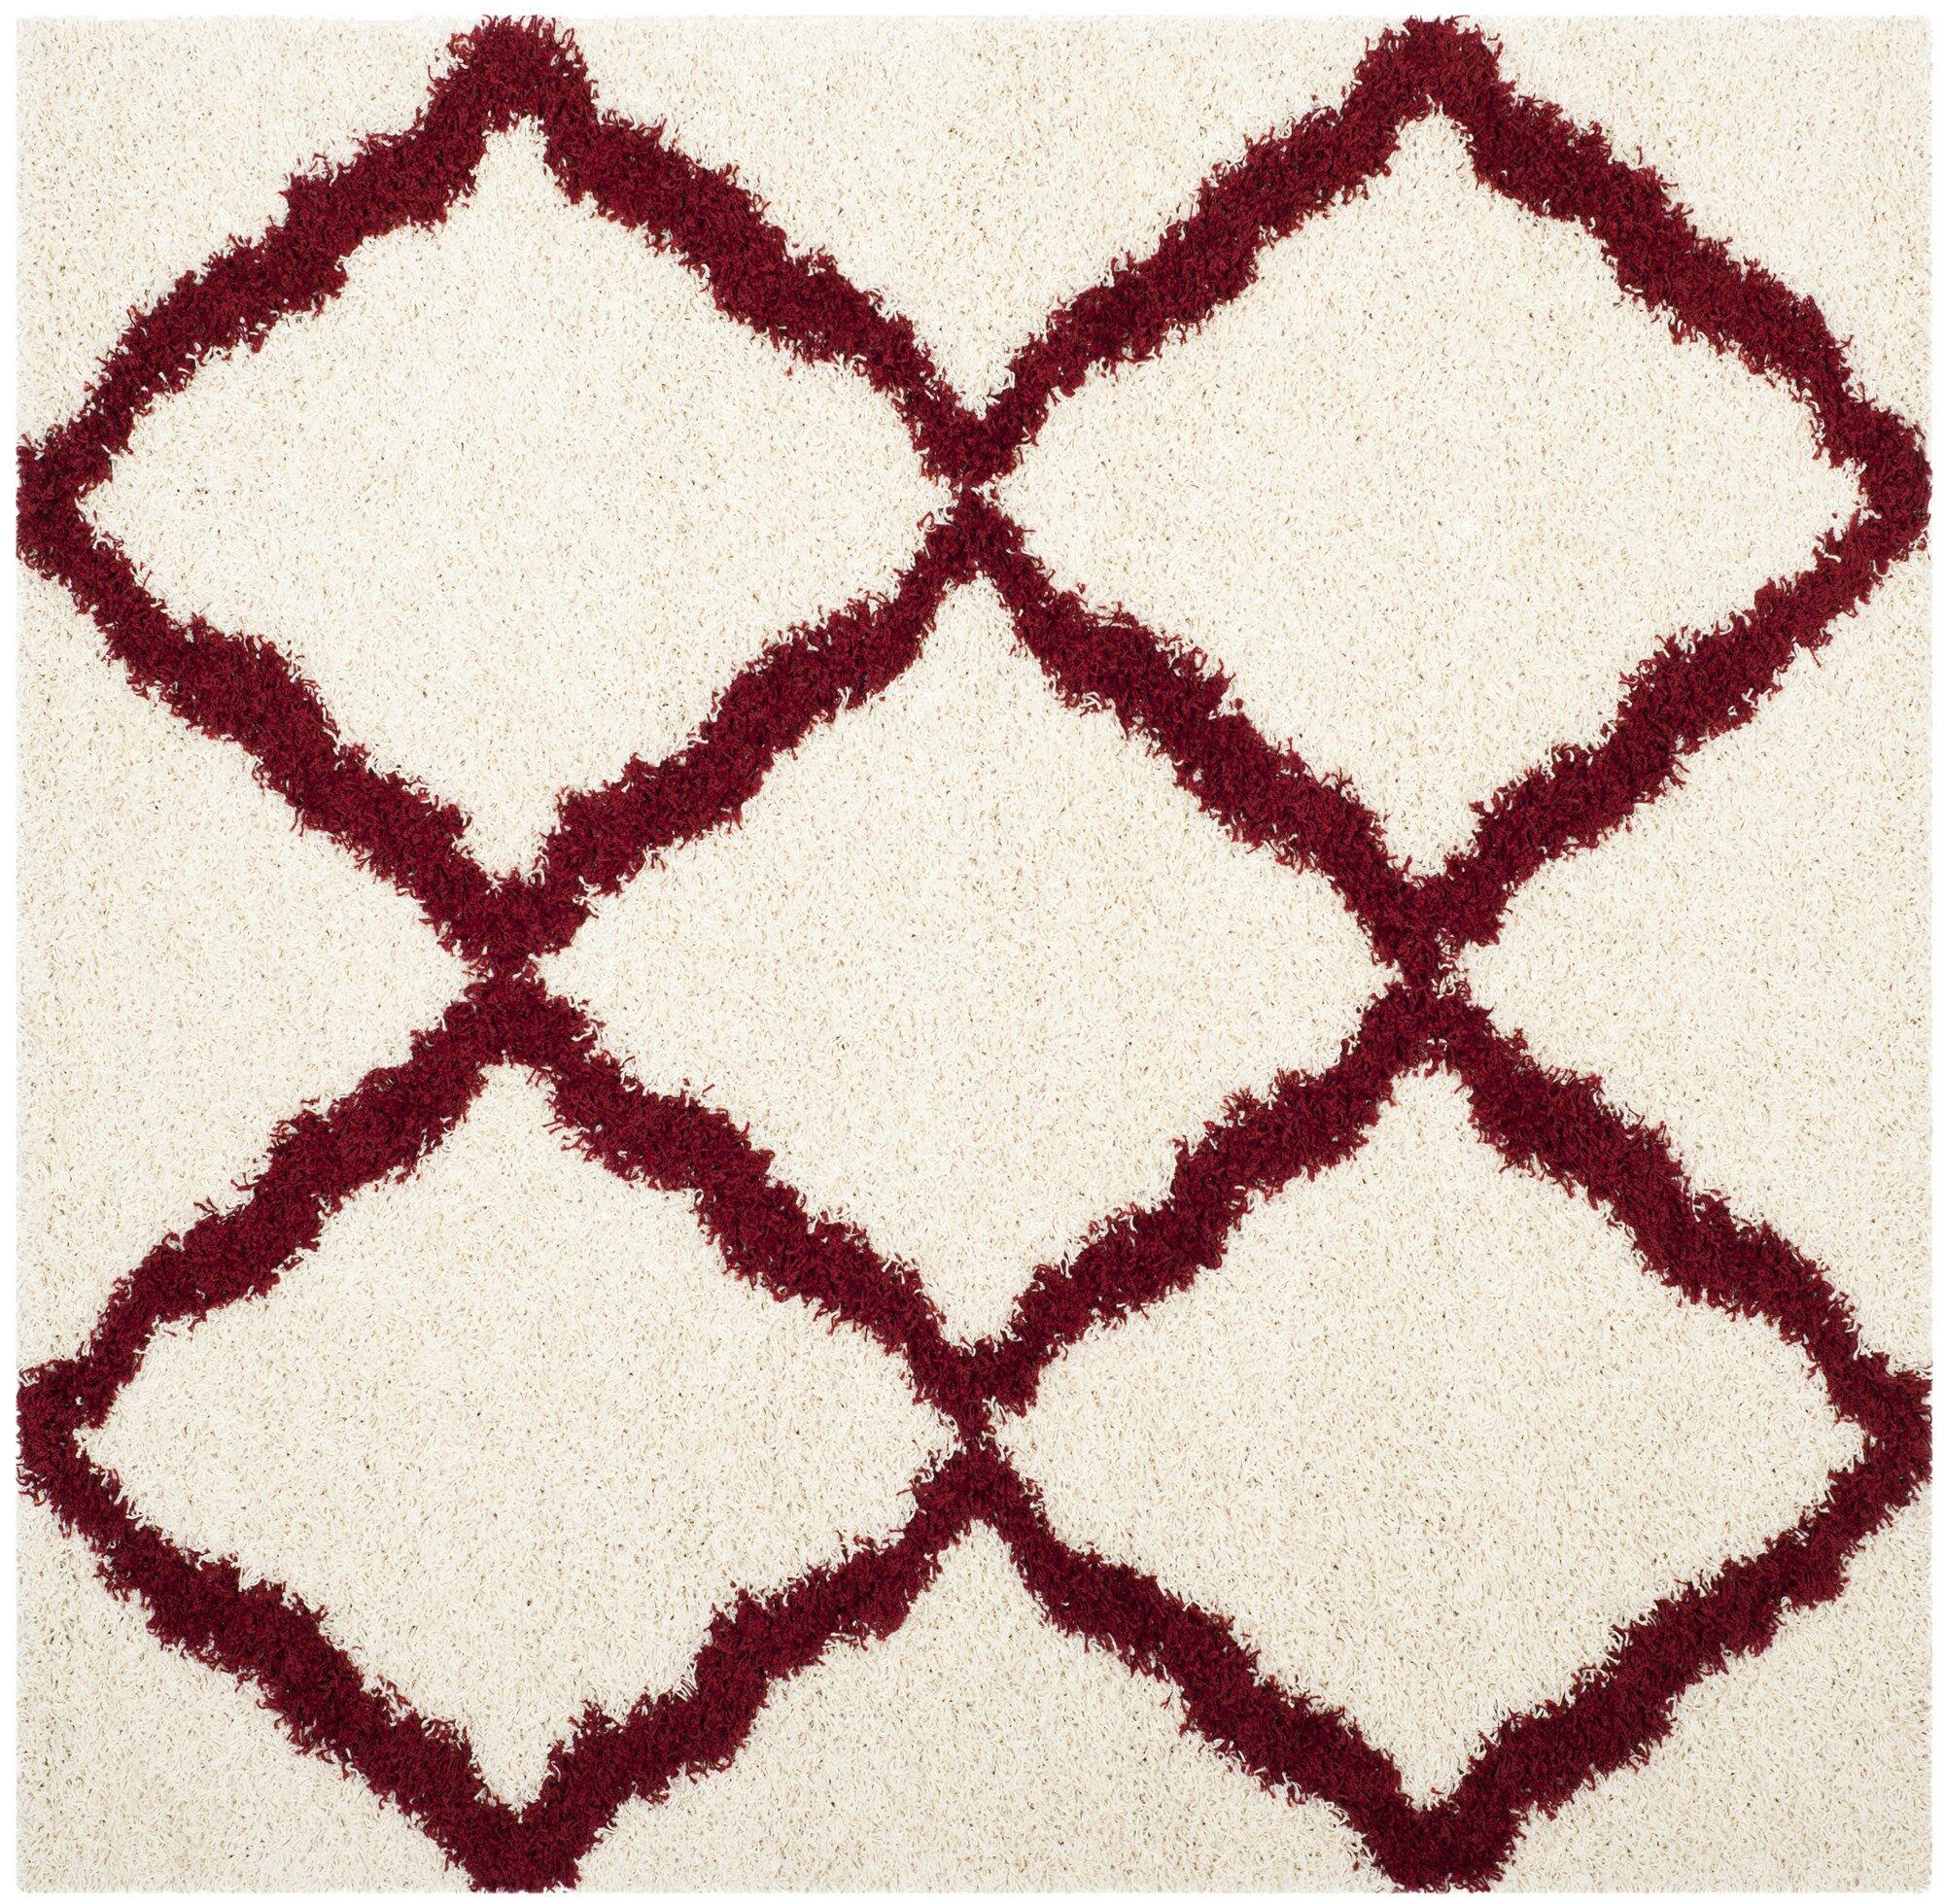 , Square 6' x 6' Charmain Ivory Area Rug